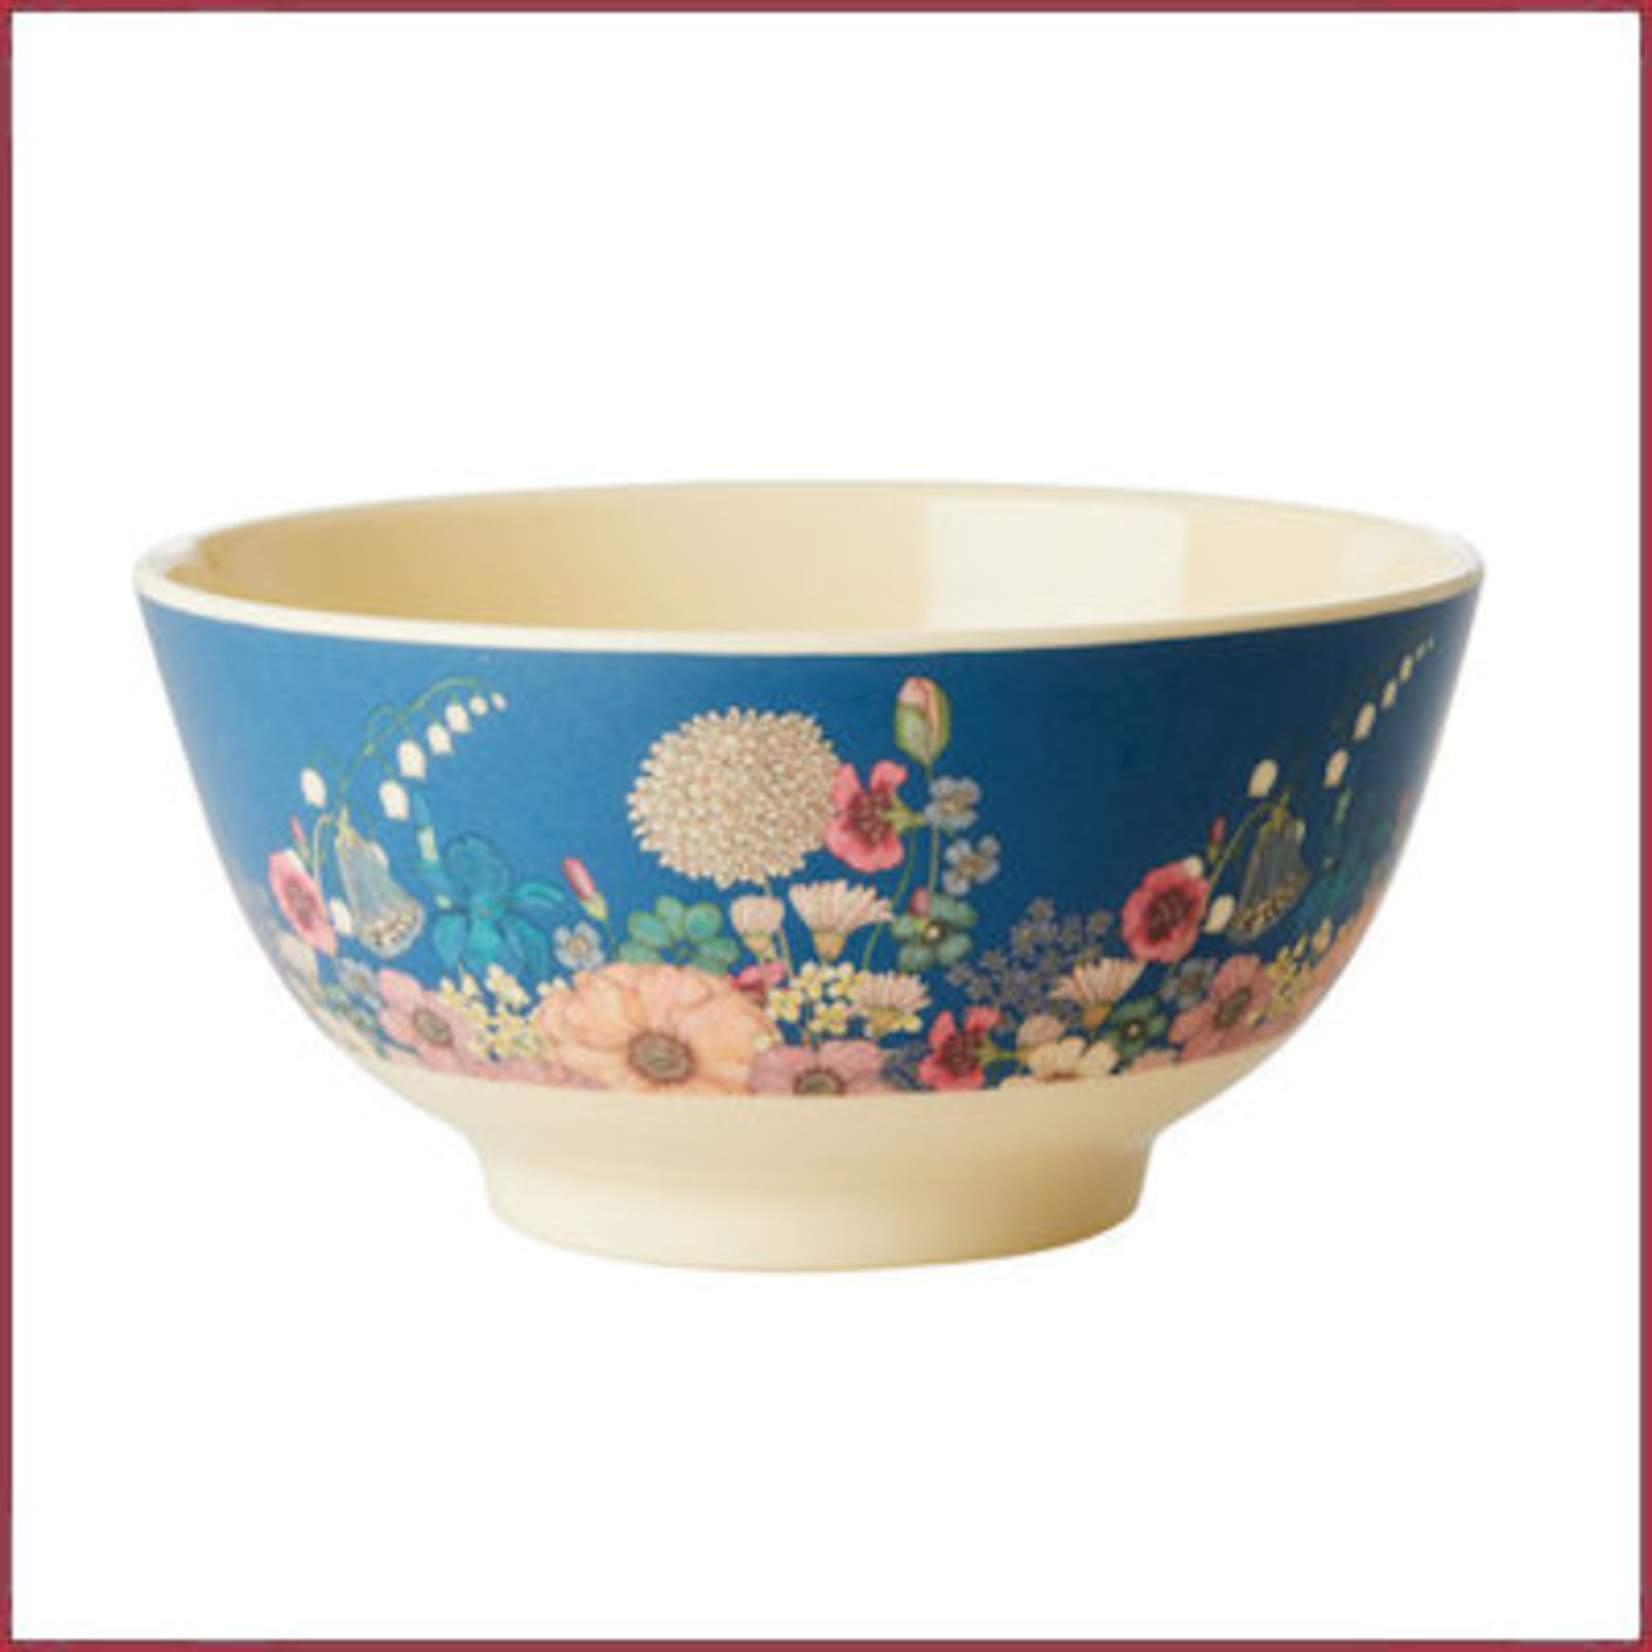 Rice Rice Melamine Bowl met Flower Collage Print - Two Tone - Medium